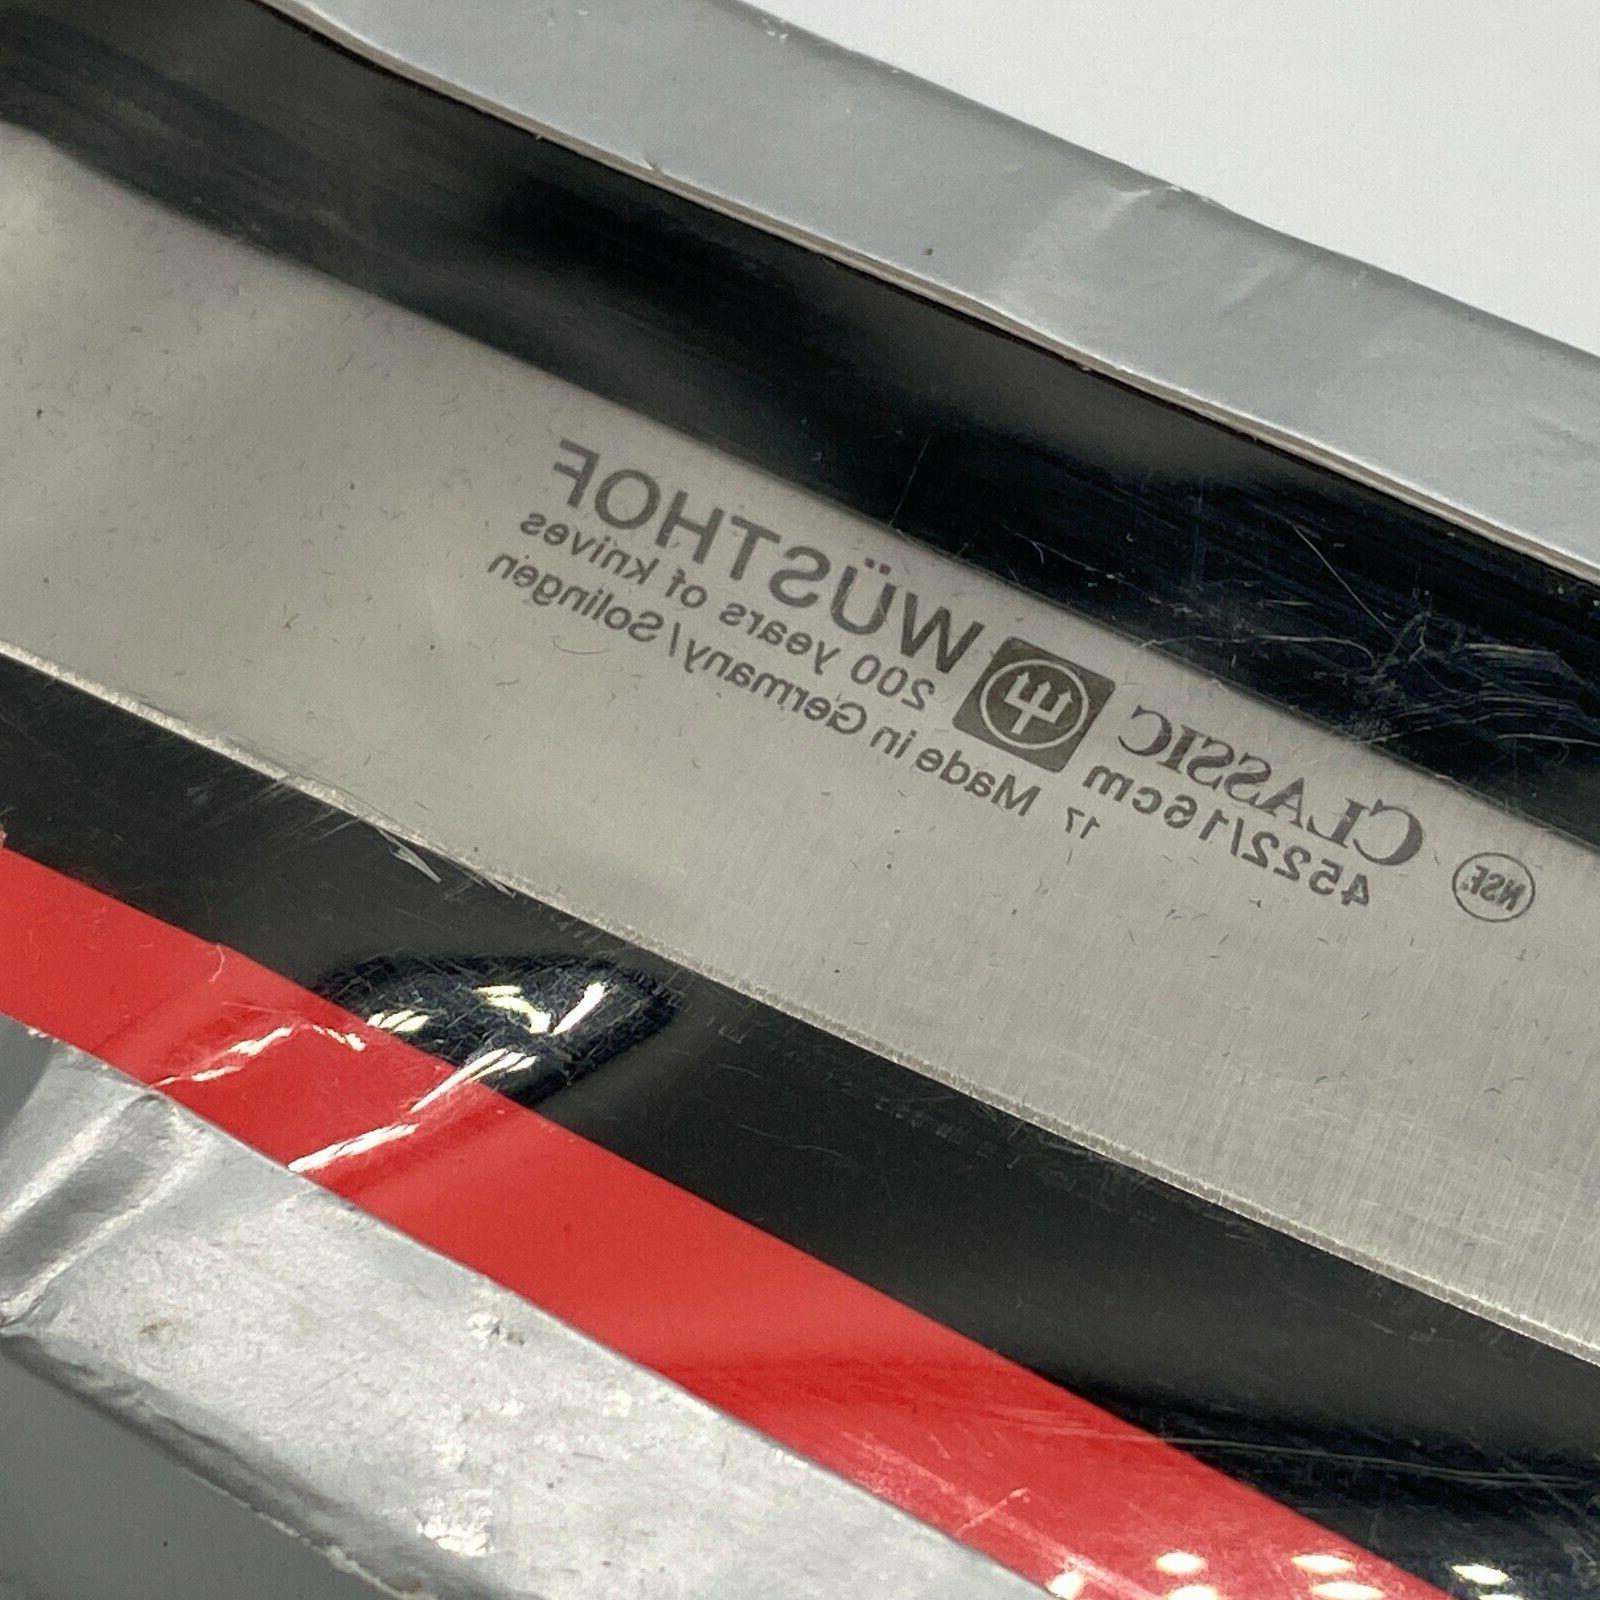 Wüsthof 16 cm- - / Utility Knife Black